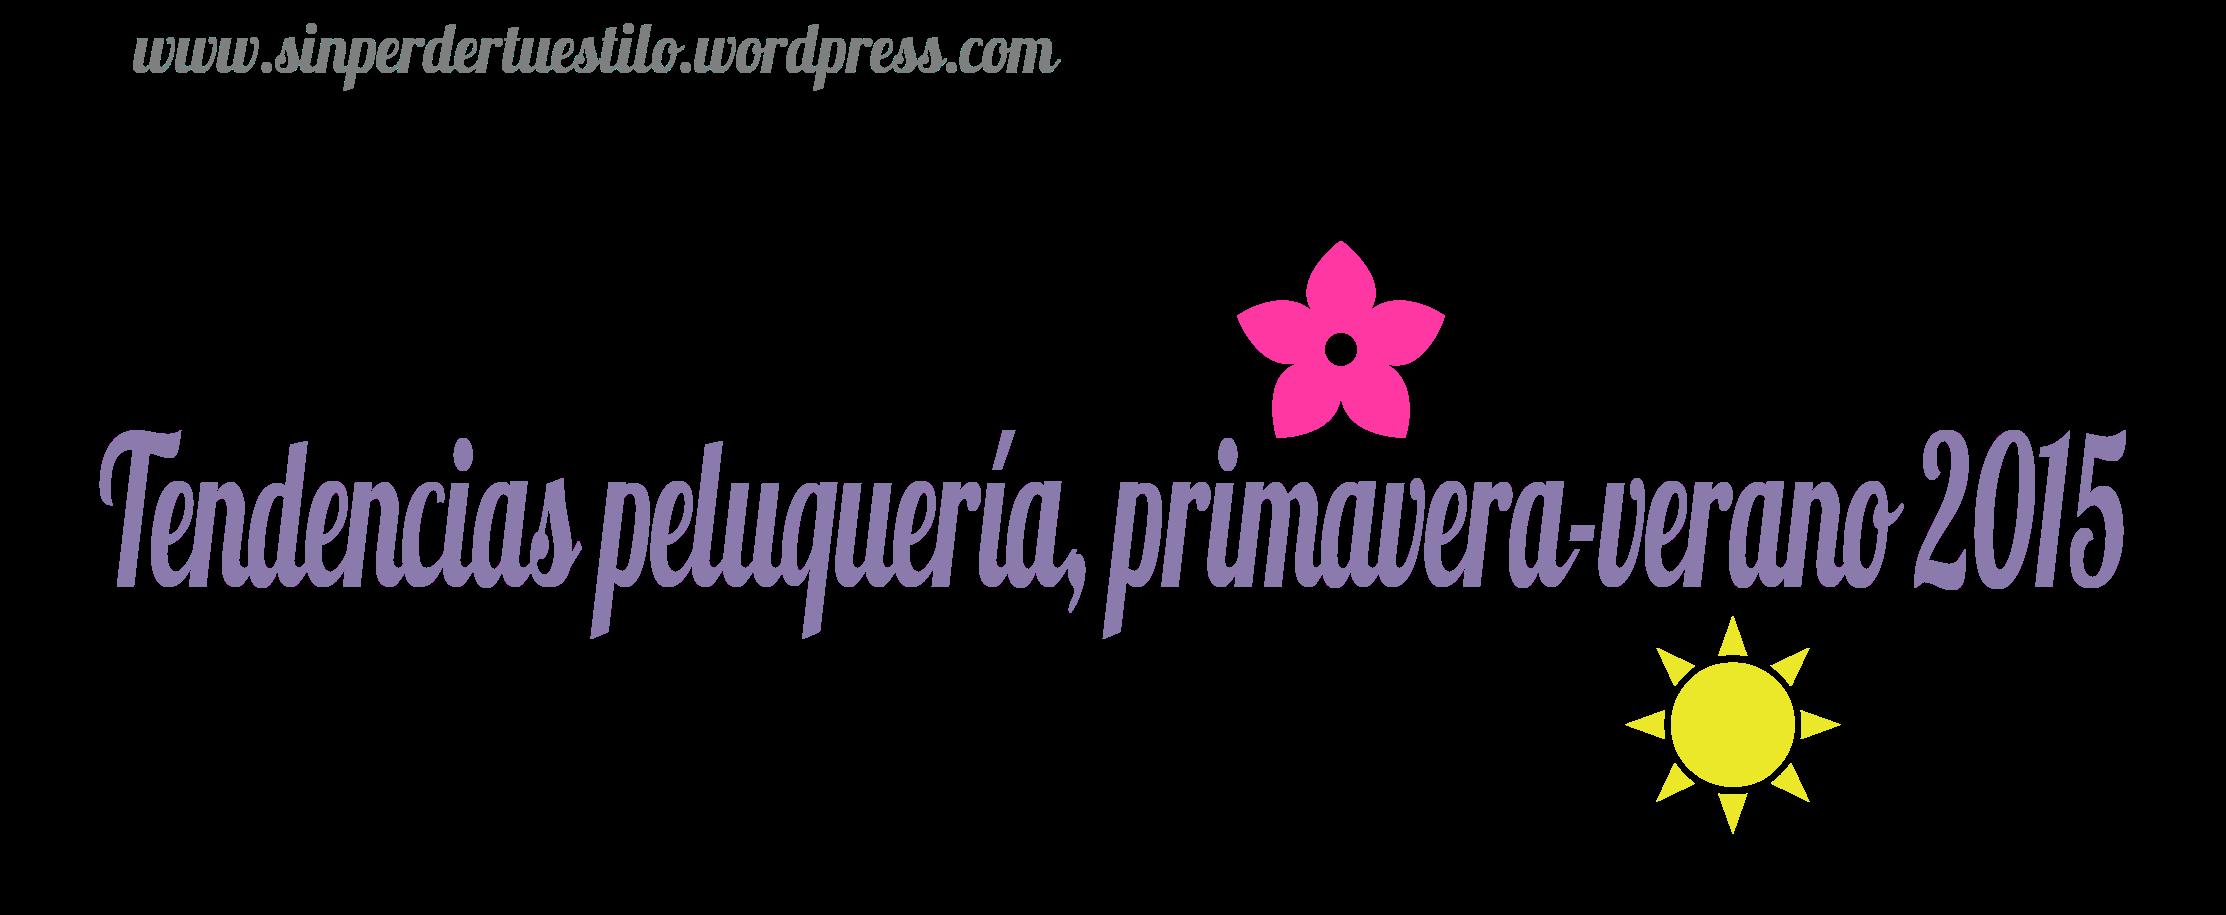 portada1-tendencias-peluqueria-primavera-verano-2015